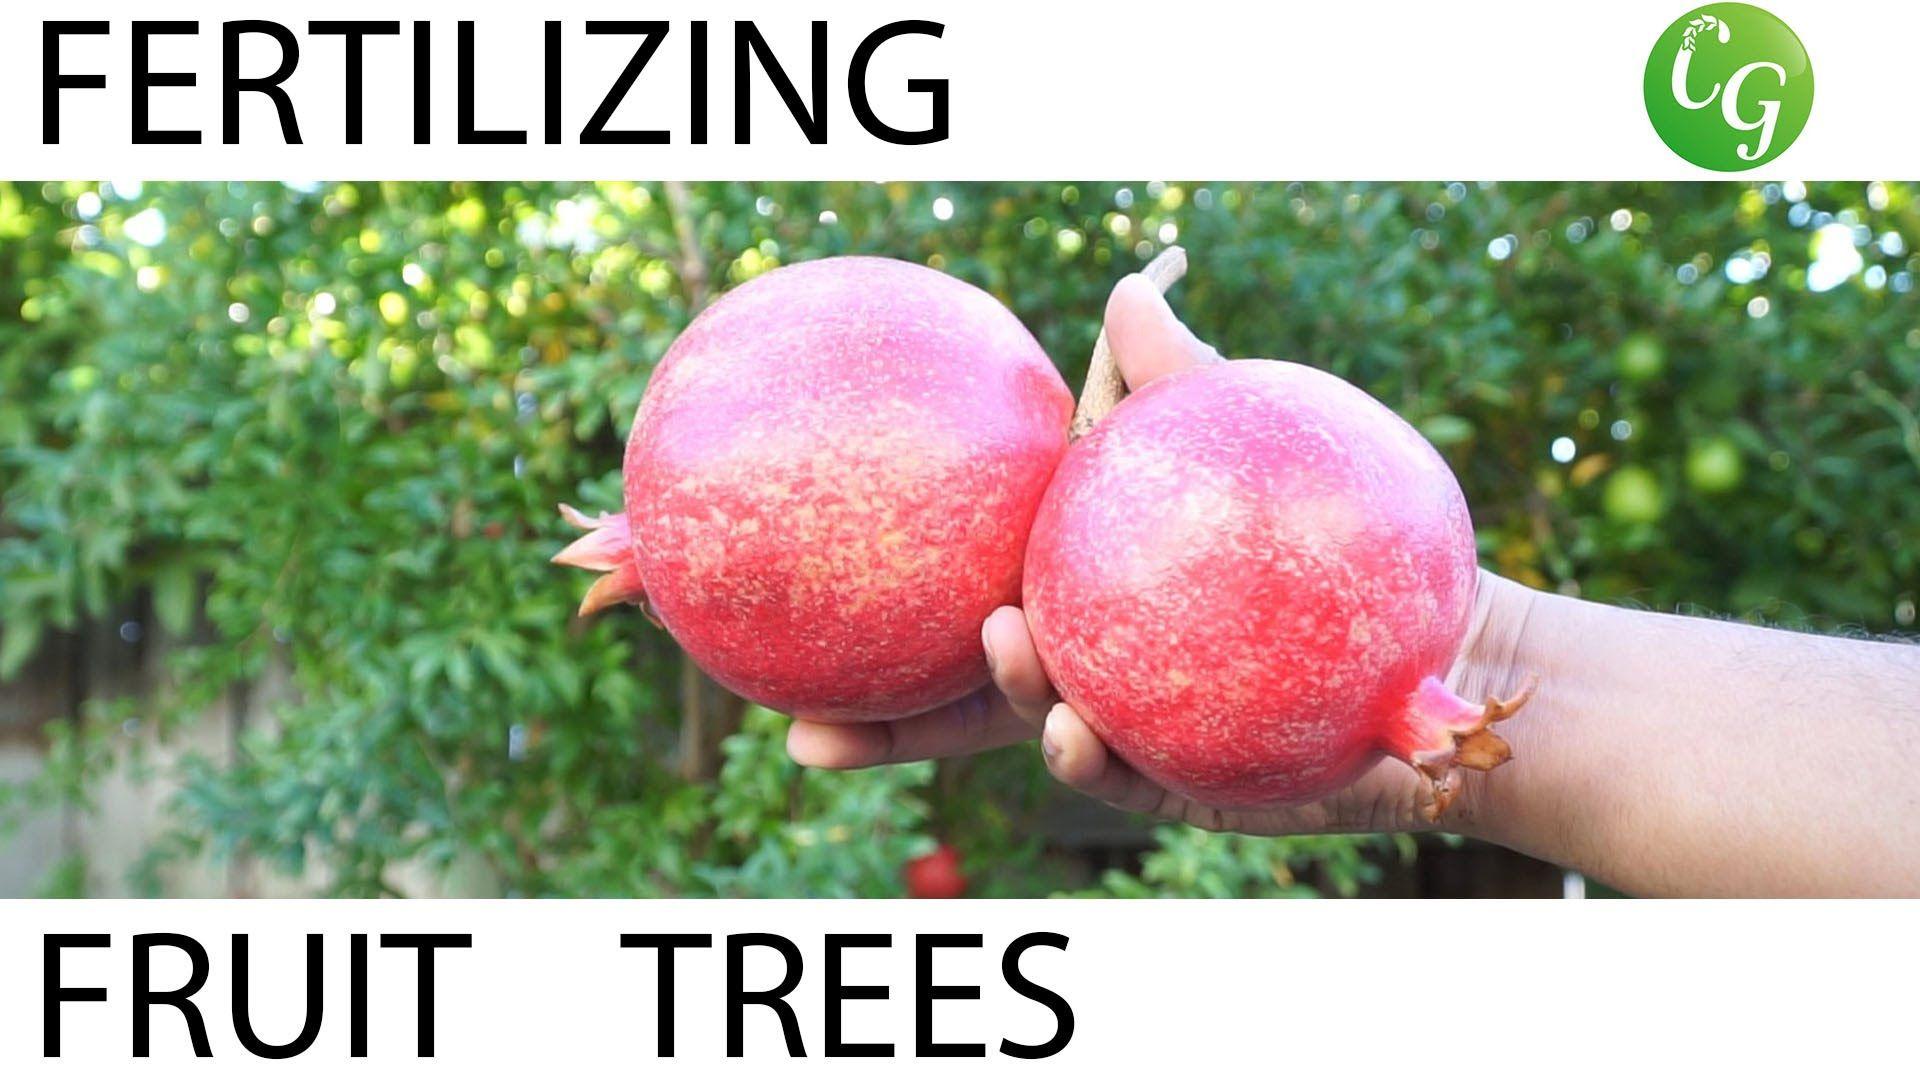 How To Fertilize Fruit Trees Fertilizing Schedule Guide Fruit Trees Planting Fruit Trees Dwarf Fruit Trees